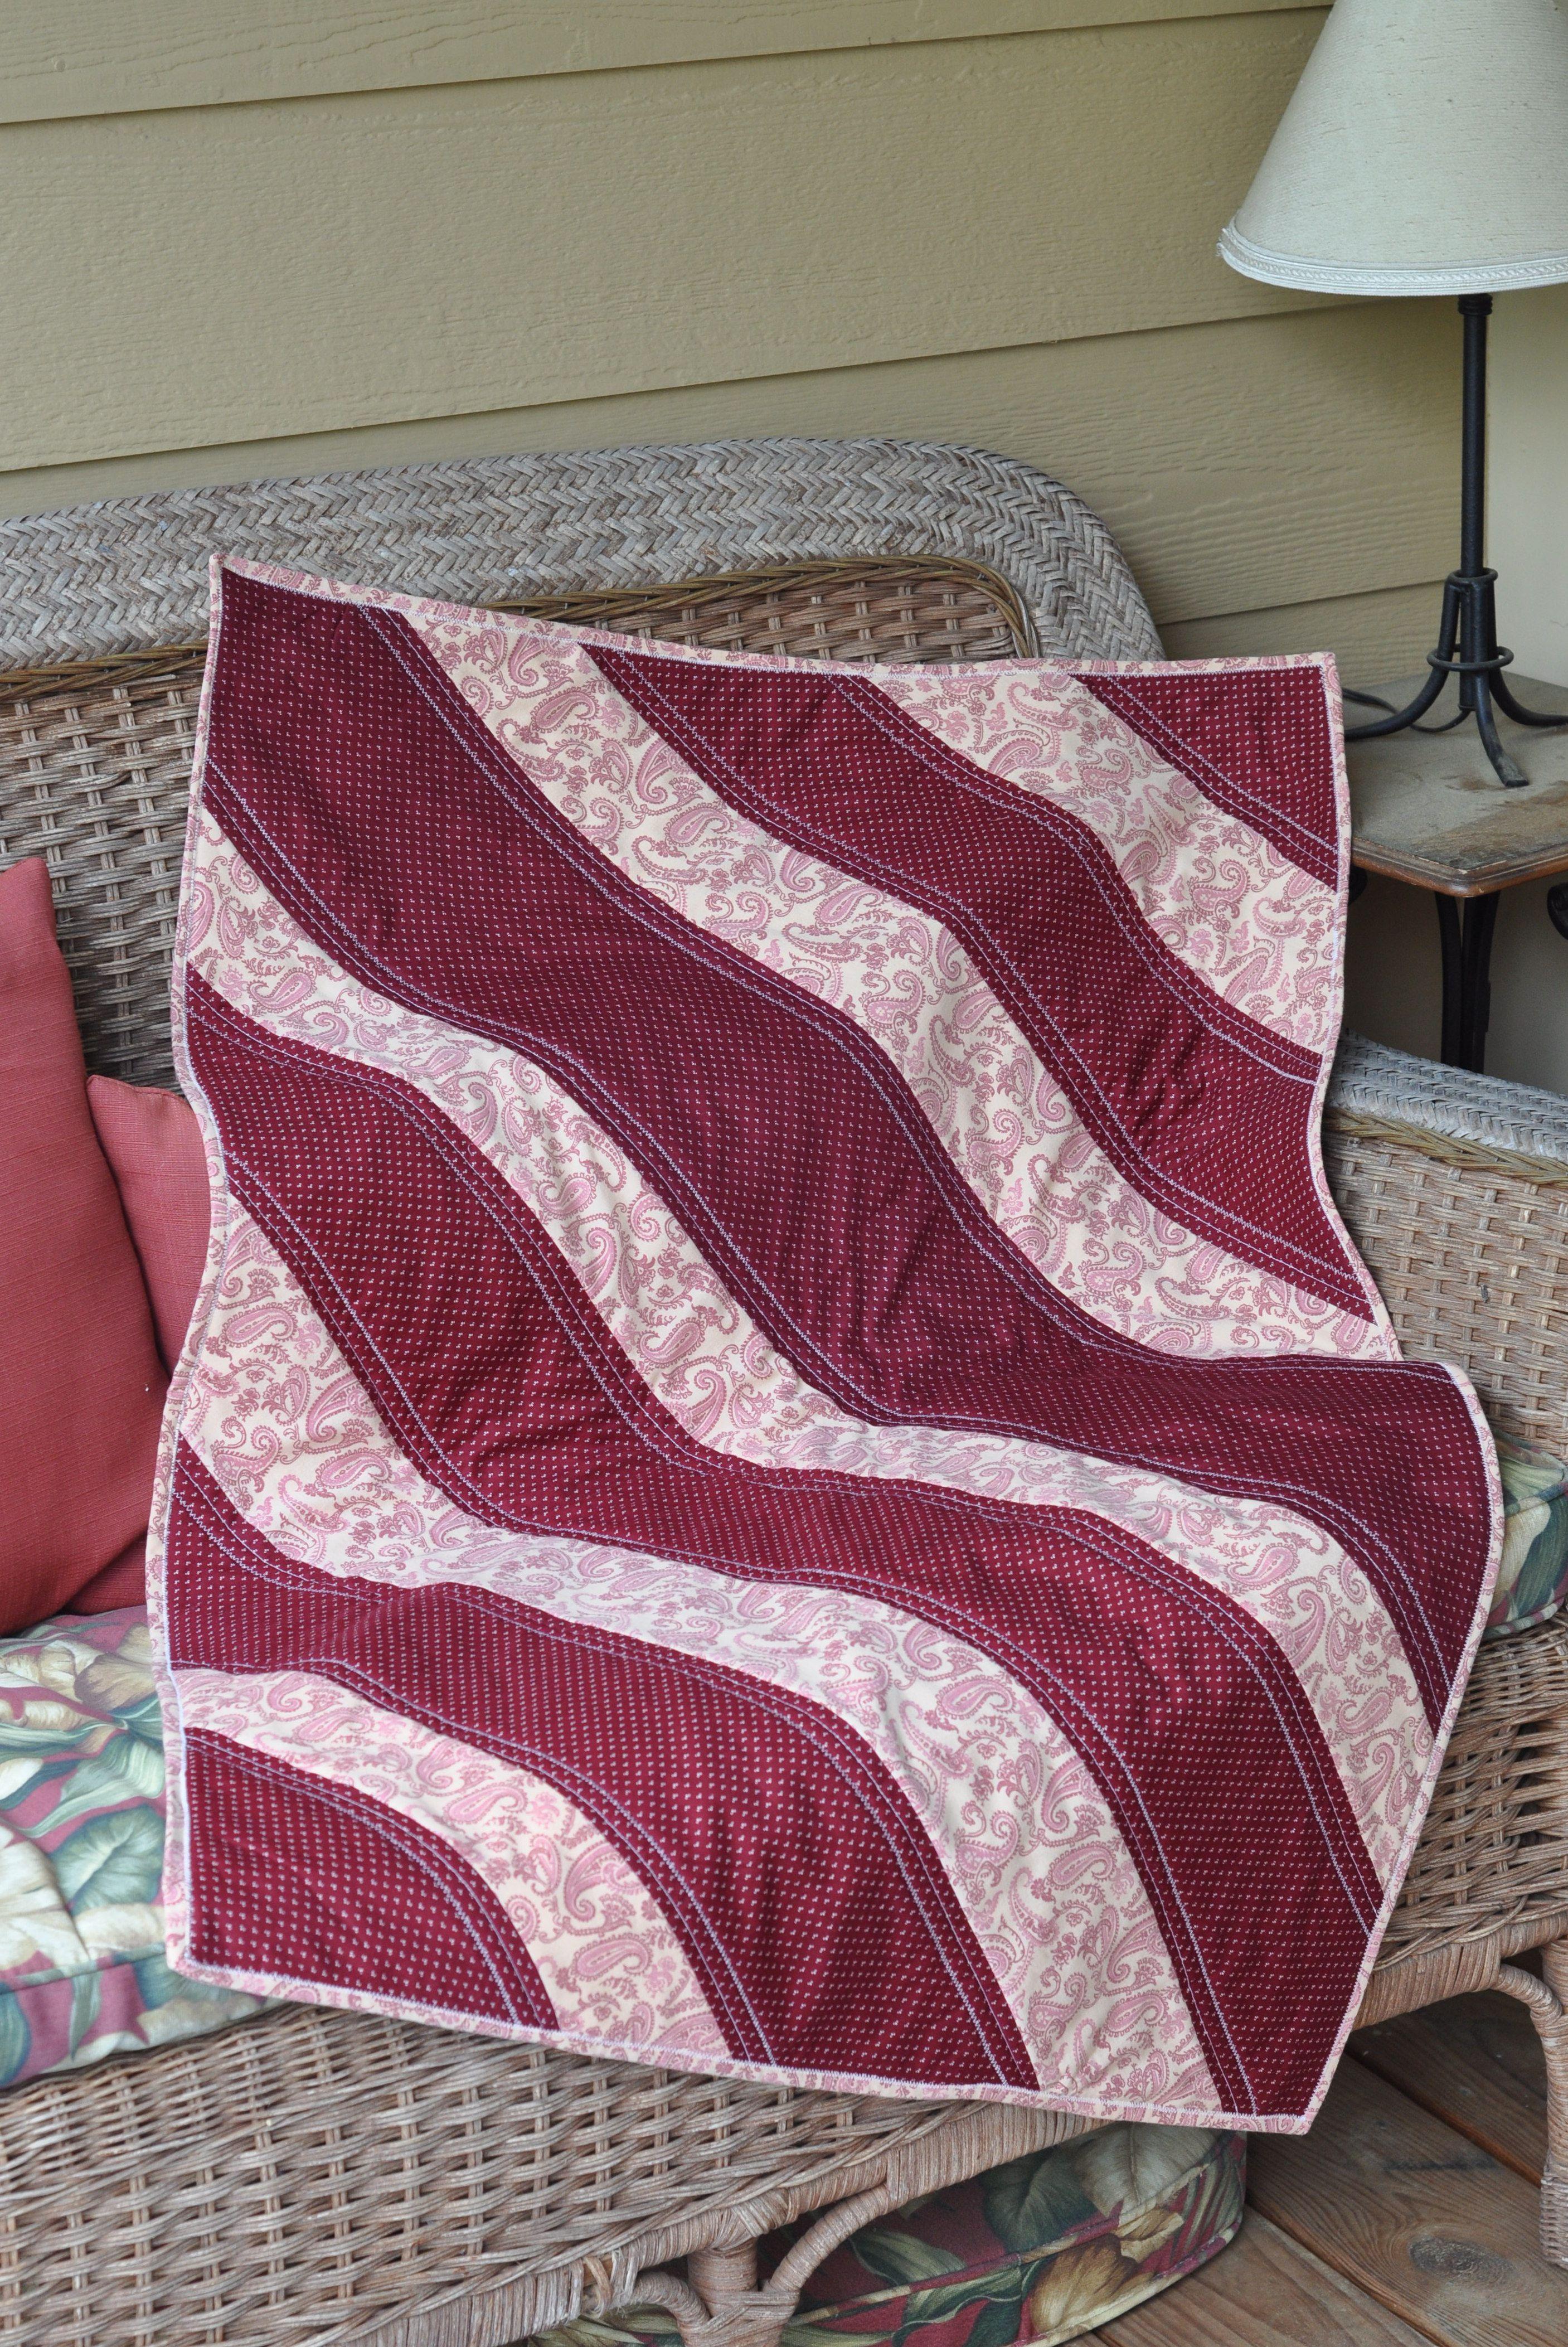 printed master comforter set mizone asha cfm product paisley hayneedle quilt by mizoneashaprintedpaisleycomforterset quilts